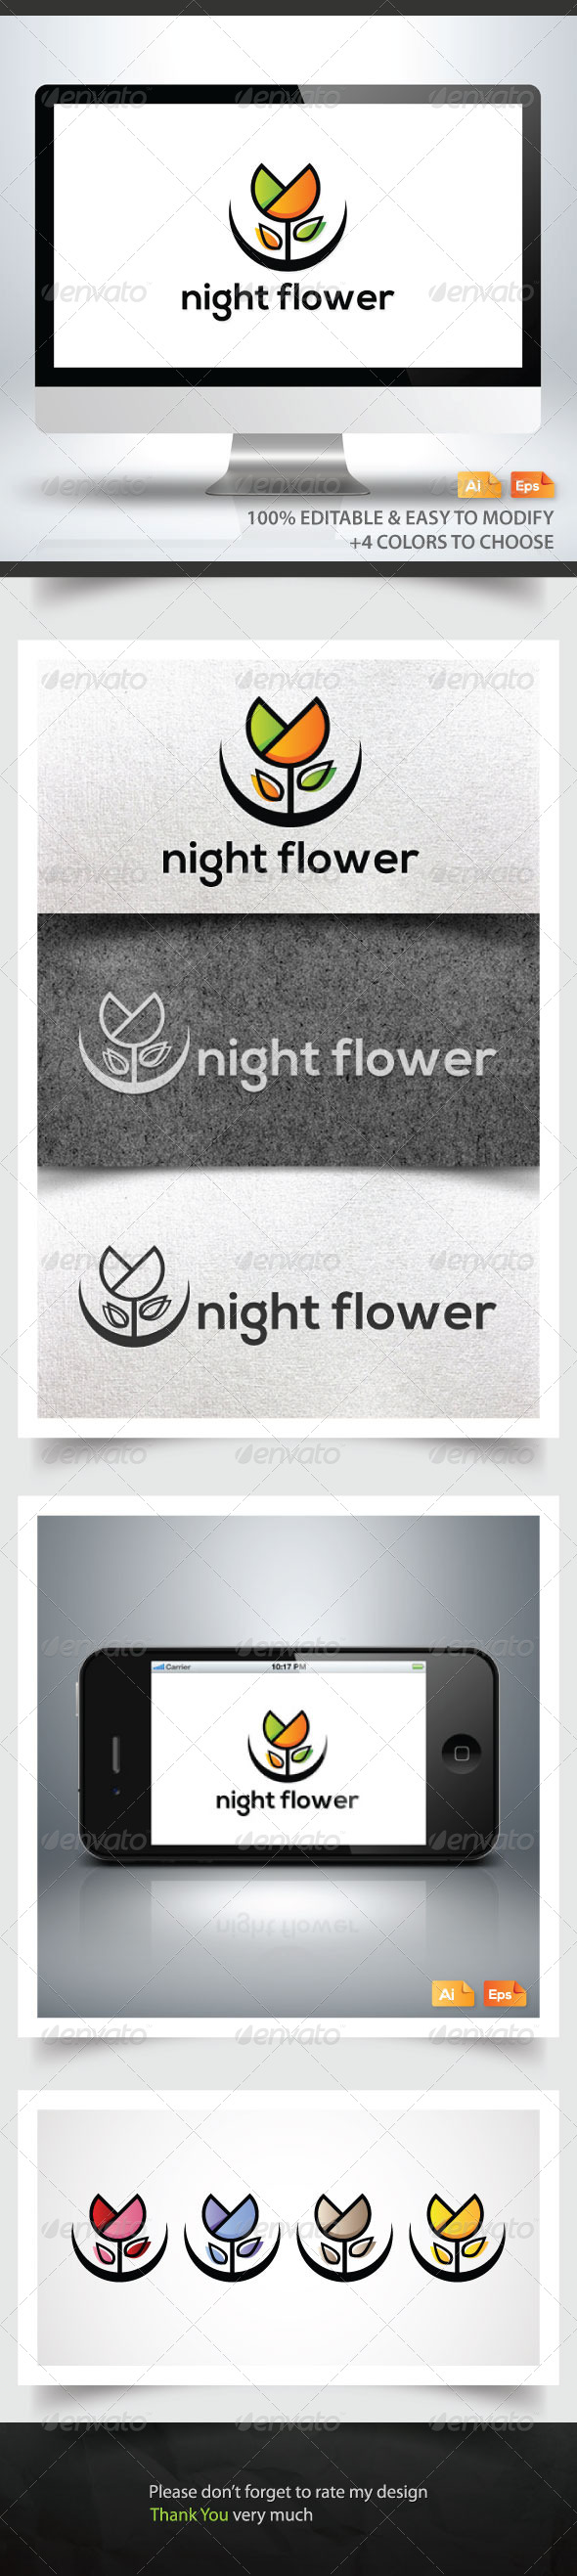 GraphicRiver Night Flower 6265575